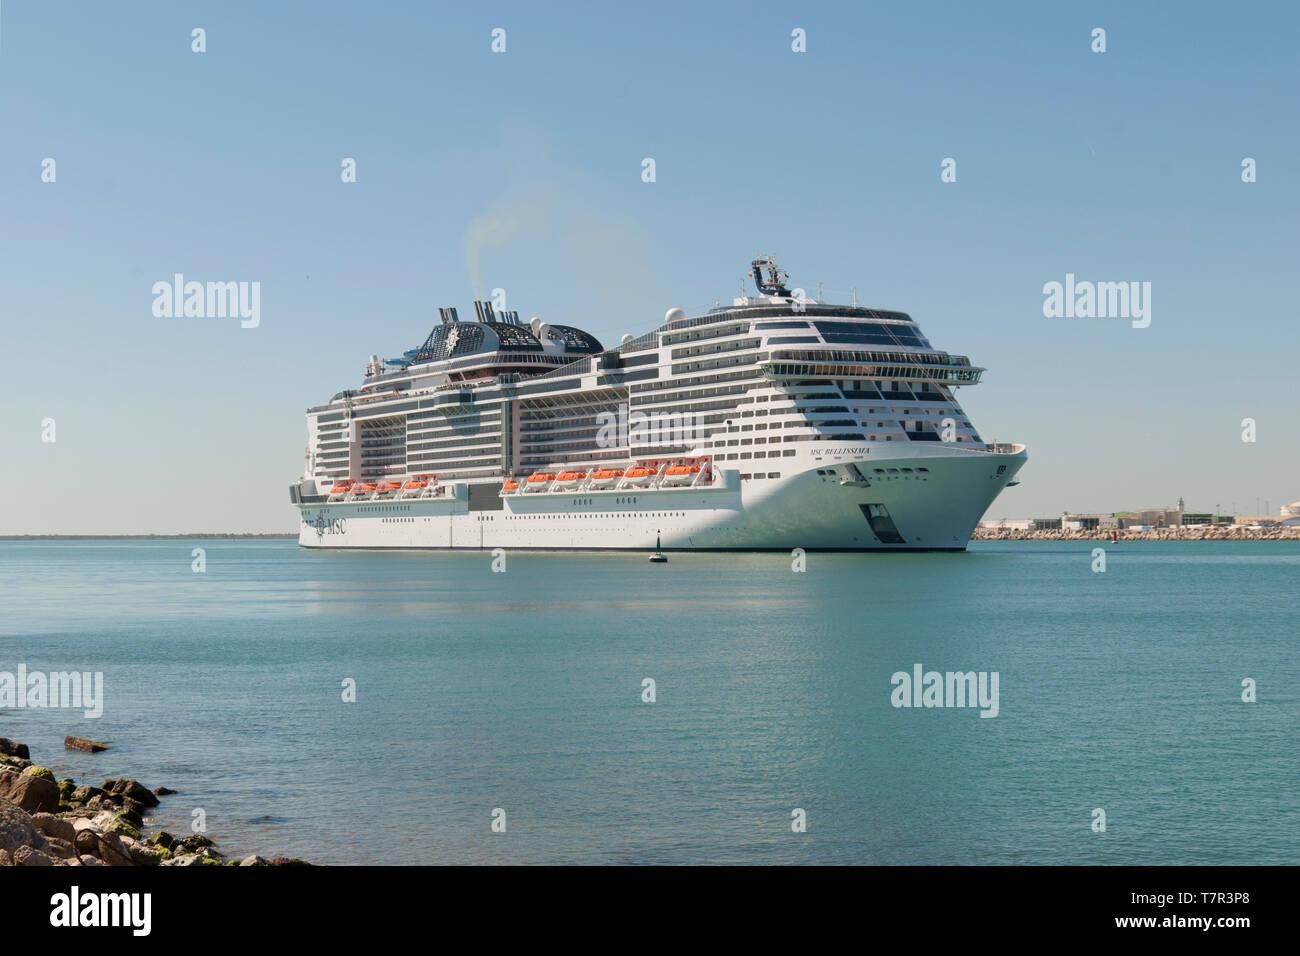 Msc Cruises Stock Photos & Msc Cruises Stock Images - Alamy